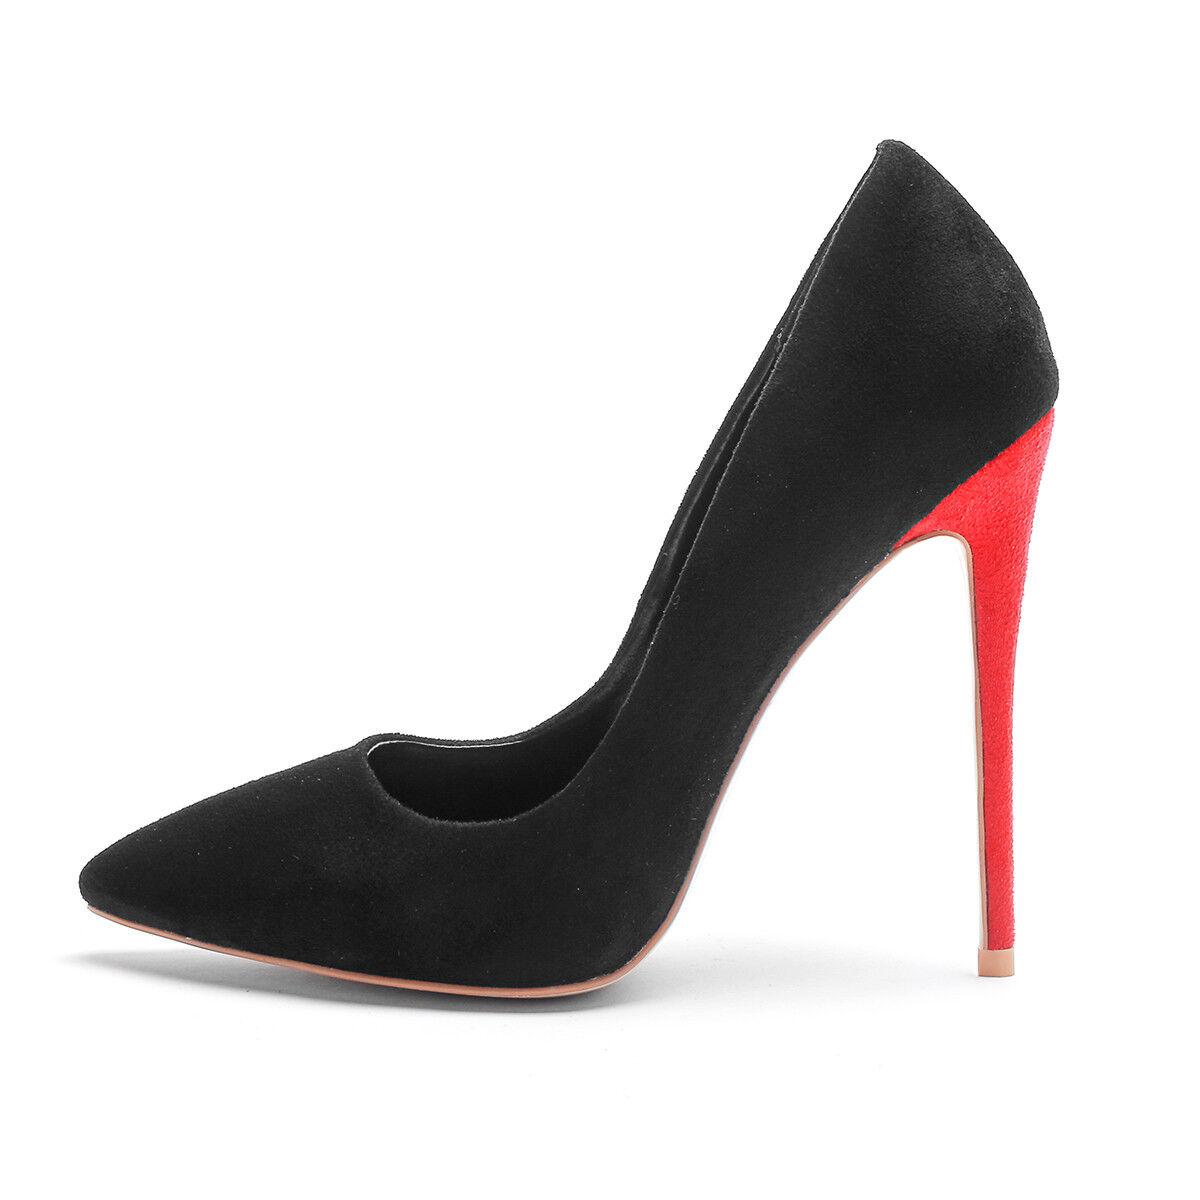 Loisirs faux-Daim Pantoufles soir elgant Pointu Chaussures Femmes Esvoiturepins Stiletto